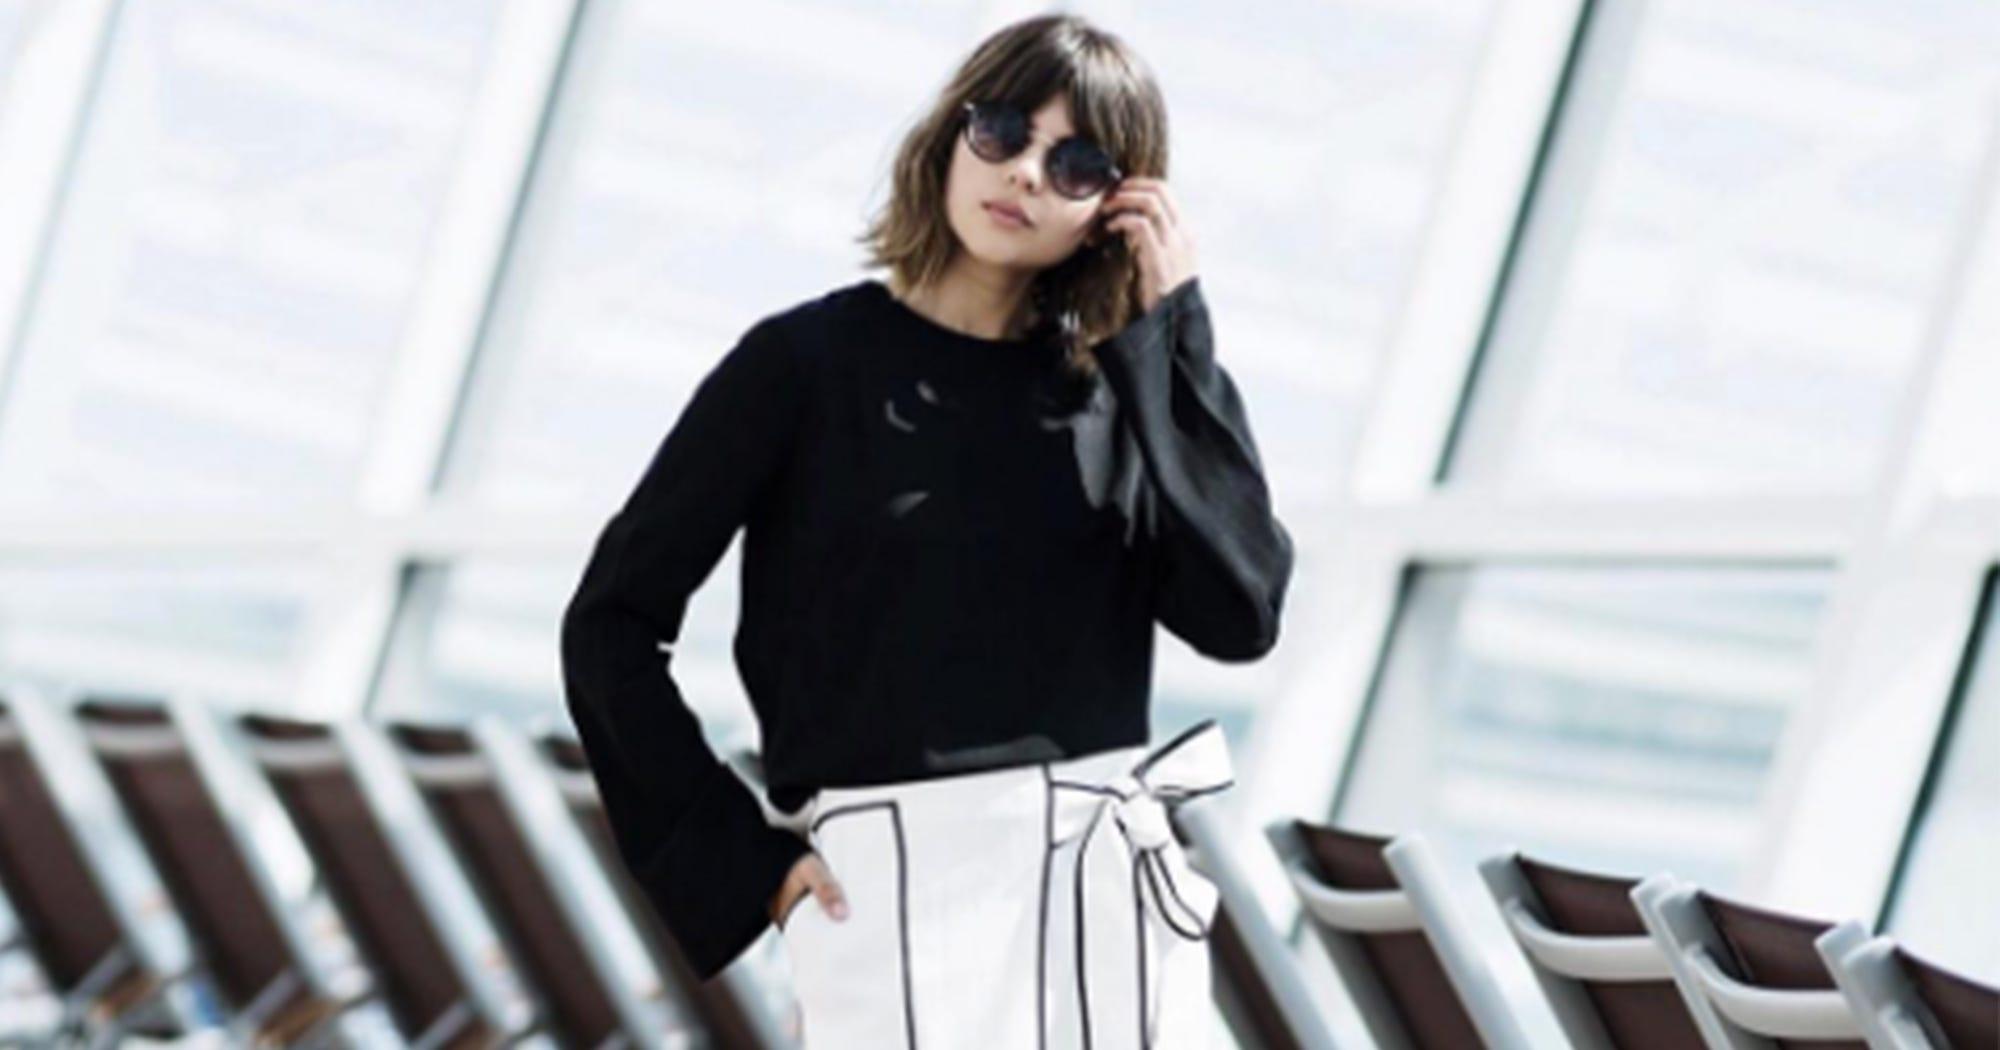 20 Ways To Take Your Fashion Instagrams To The Next Level